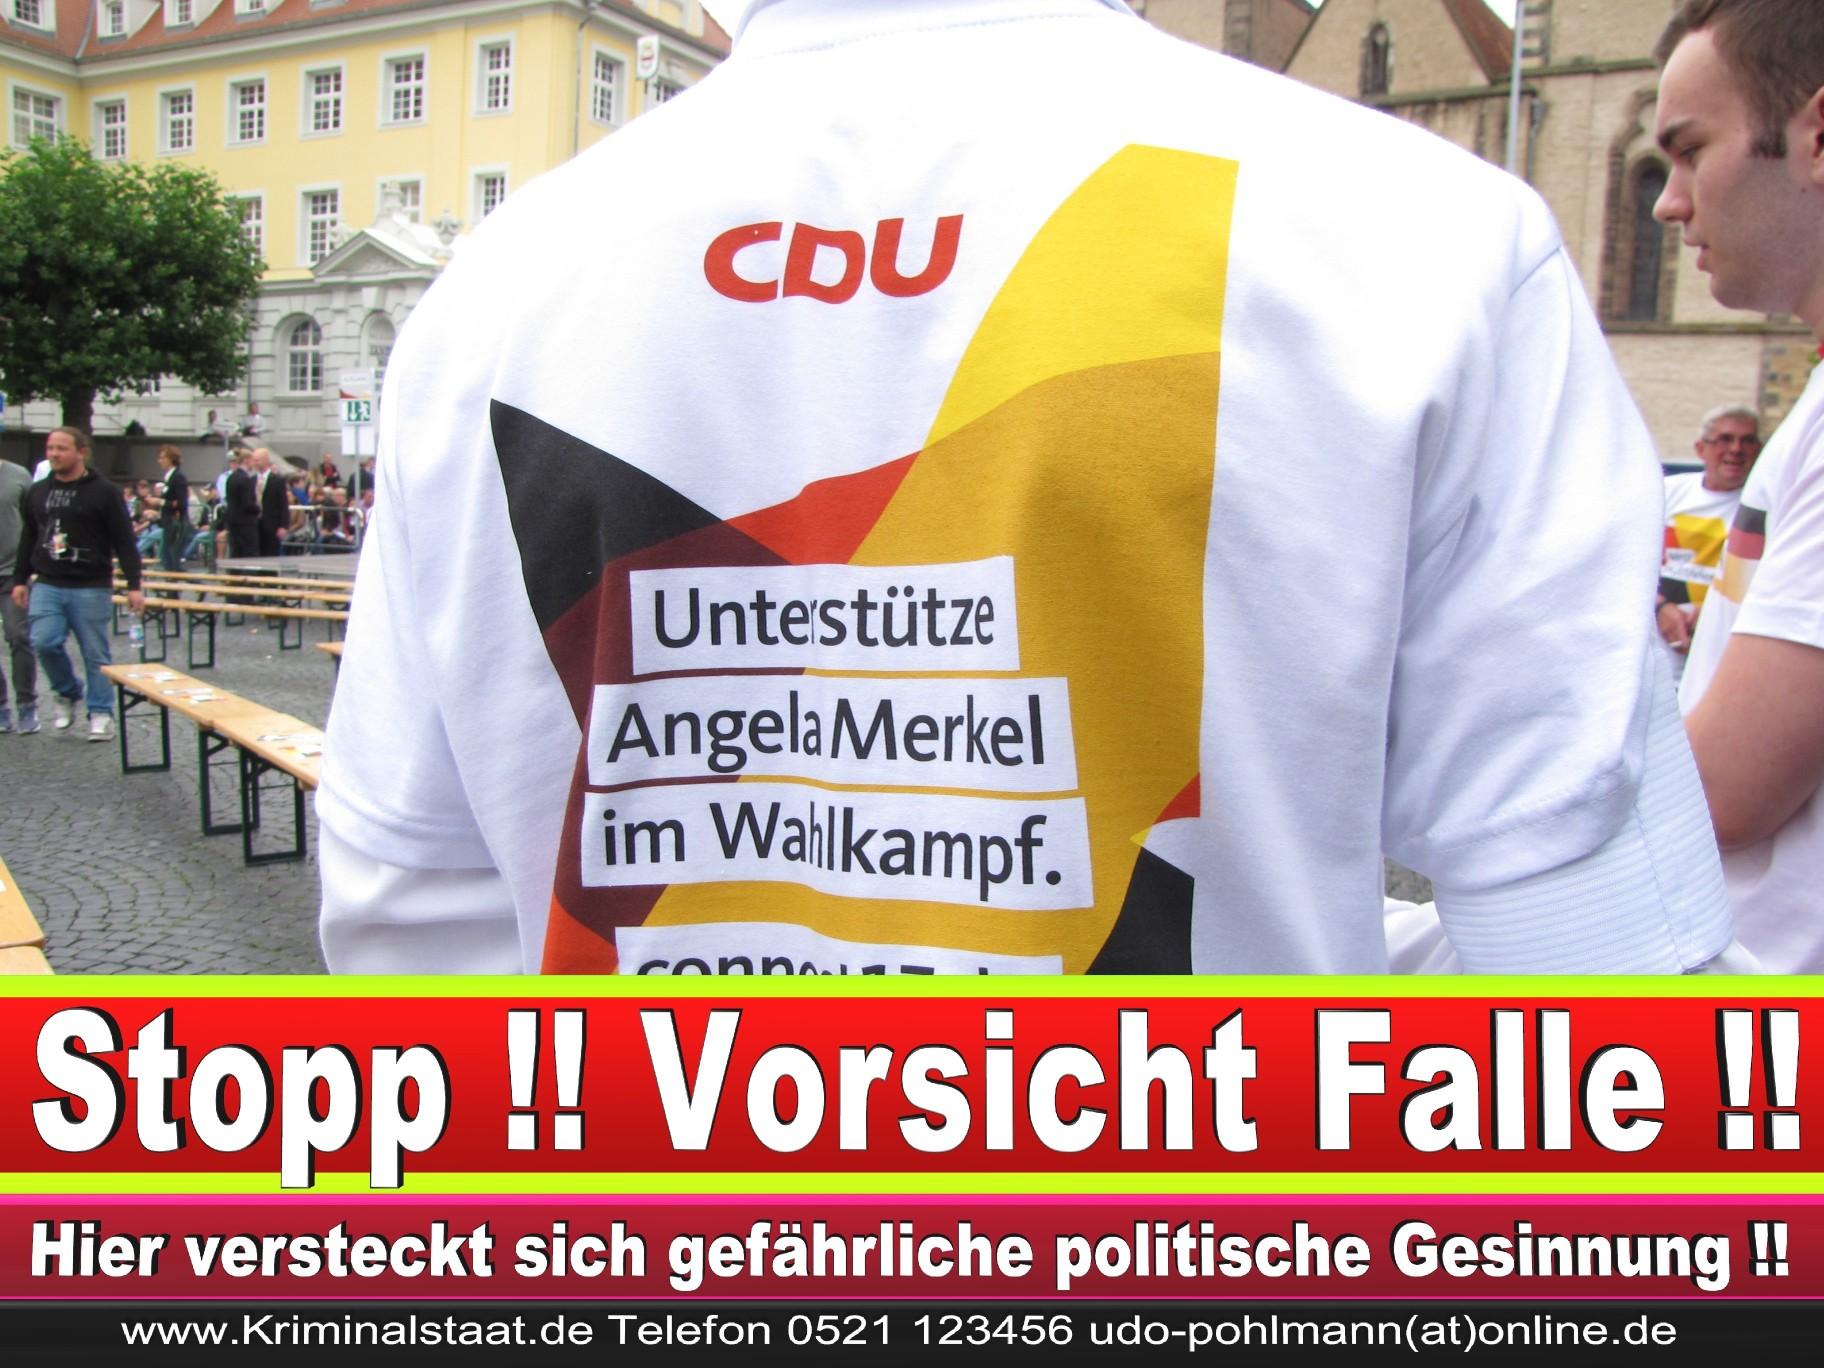 CDU HERFORD Kurruption Betrug Kinderpornografie Kinderpornos 13